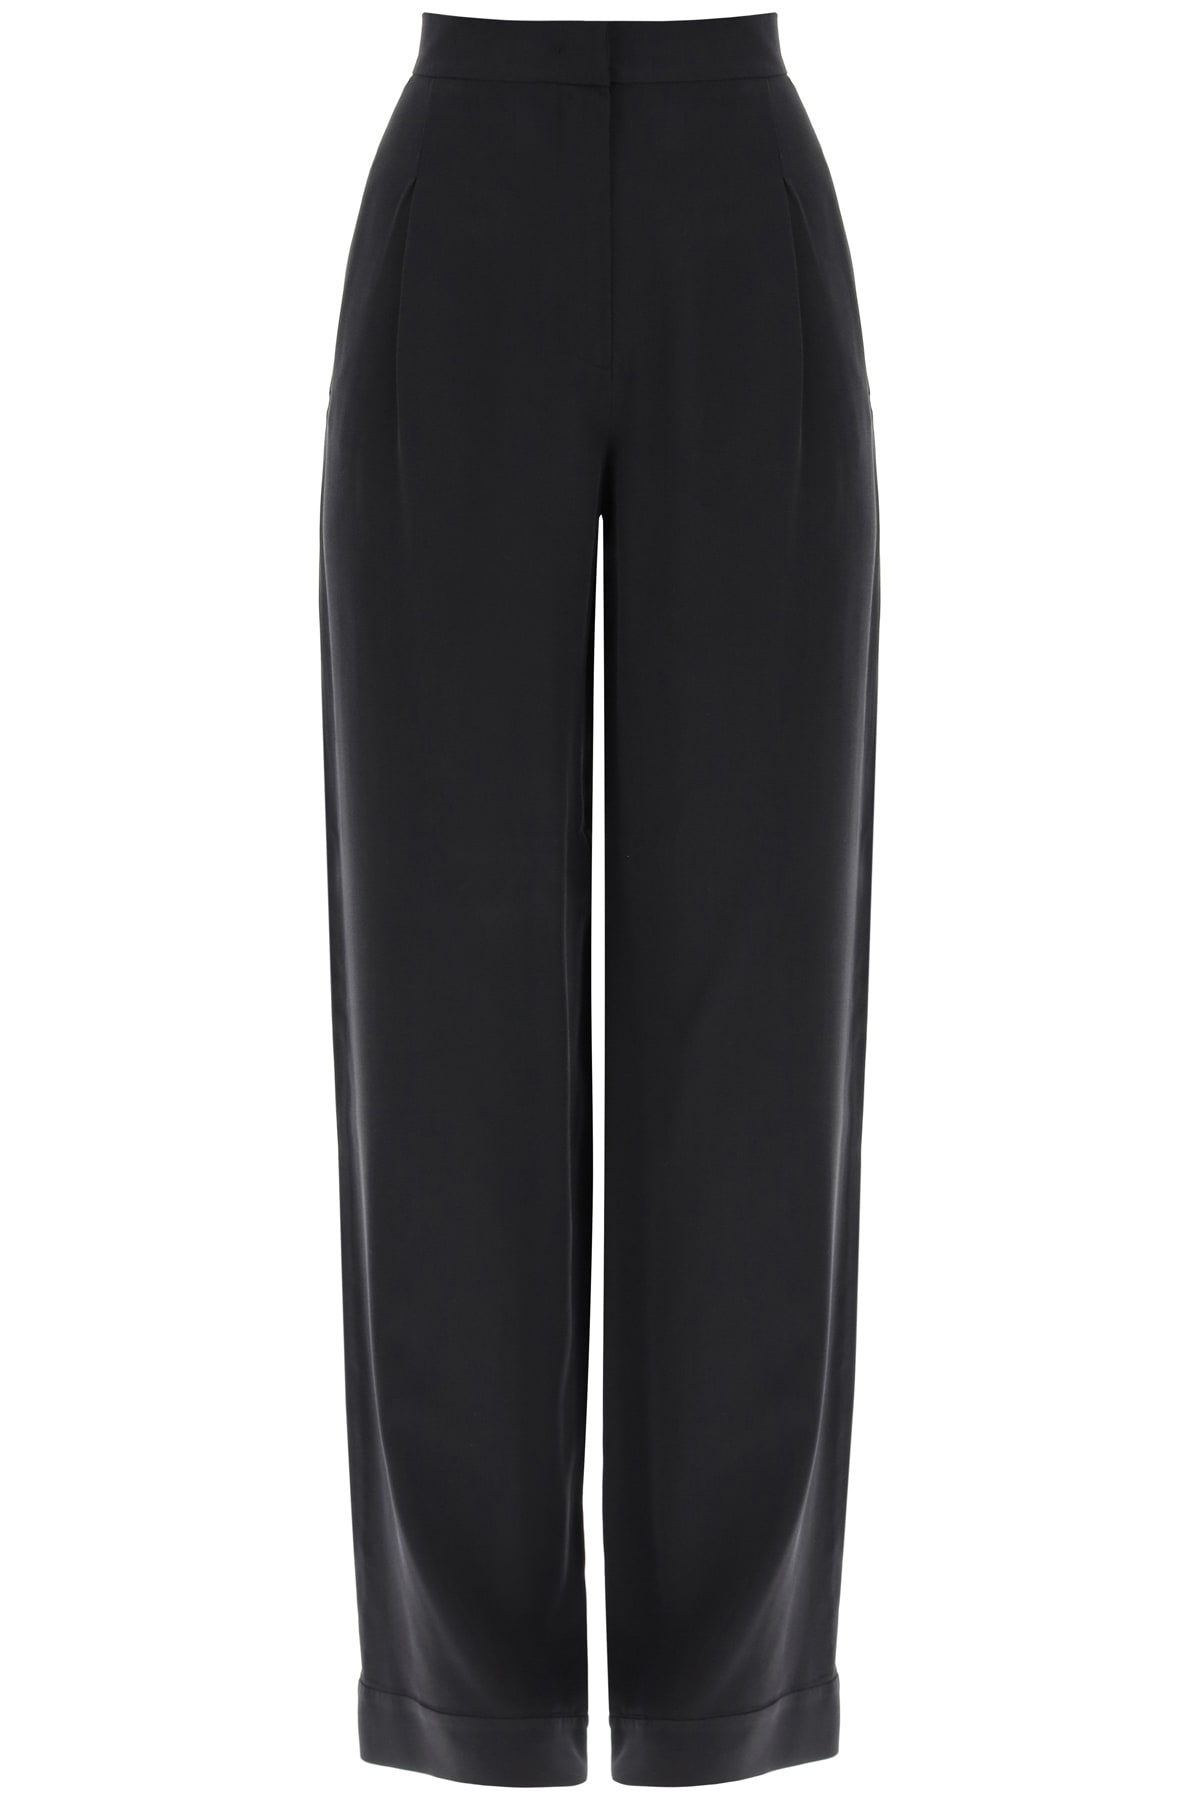 Medeola Silk Trousers